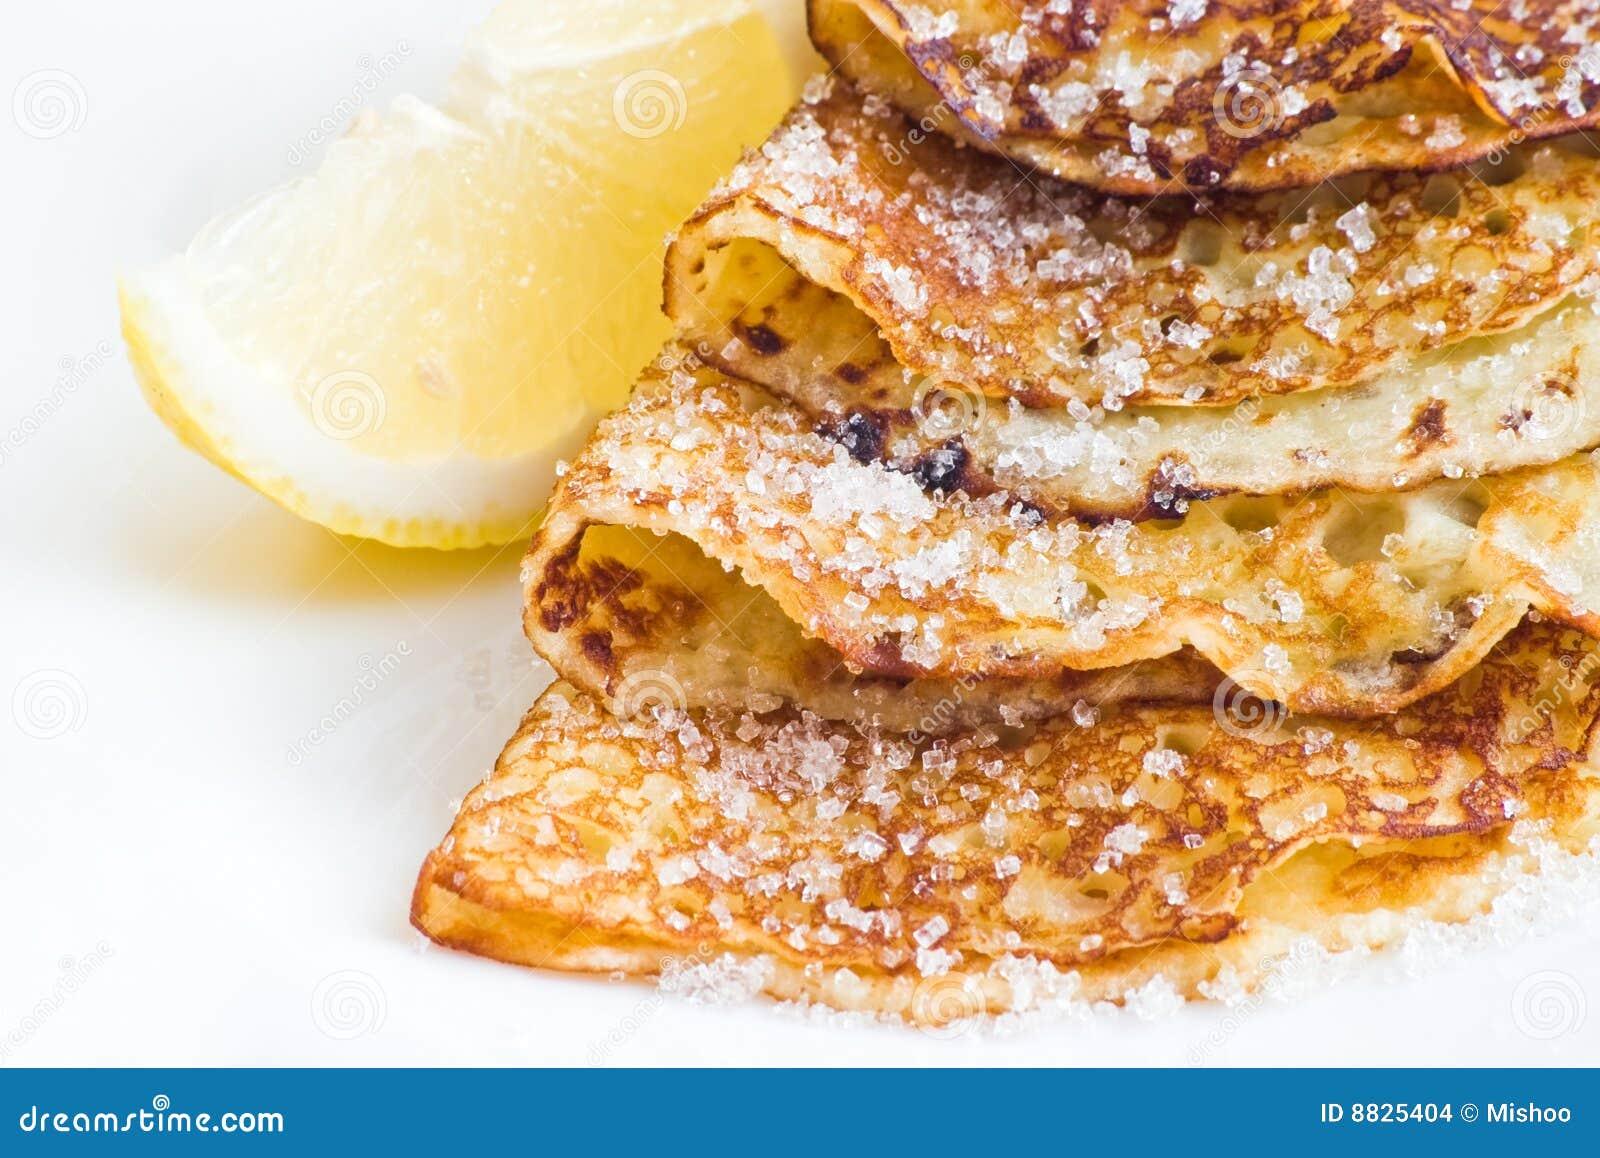 Pancakes with lemon